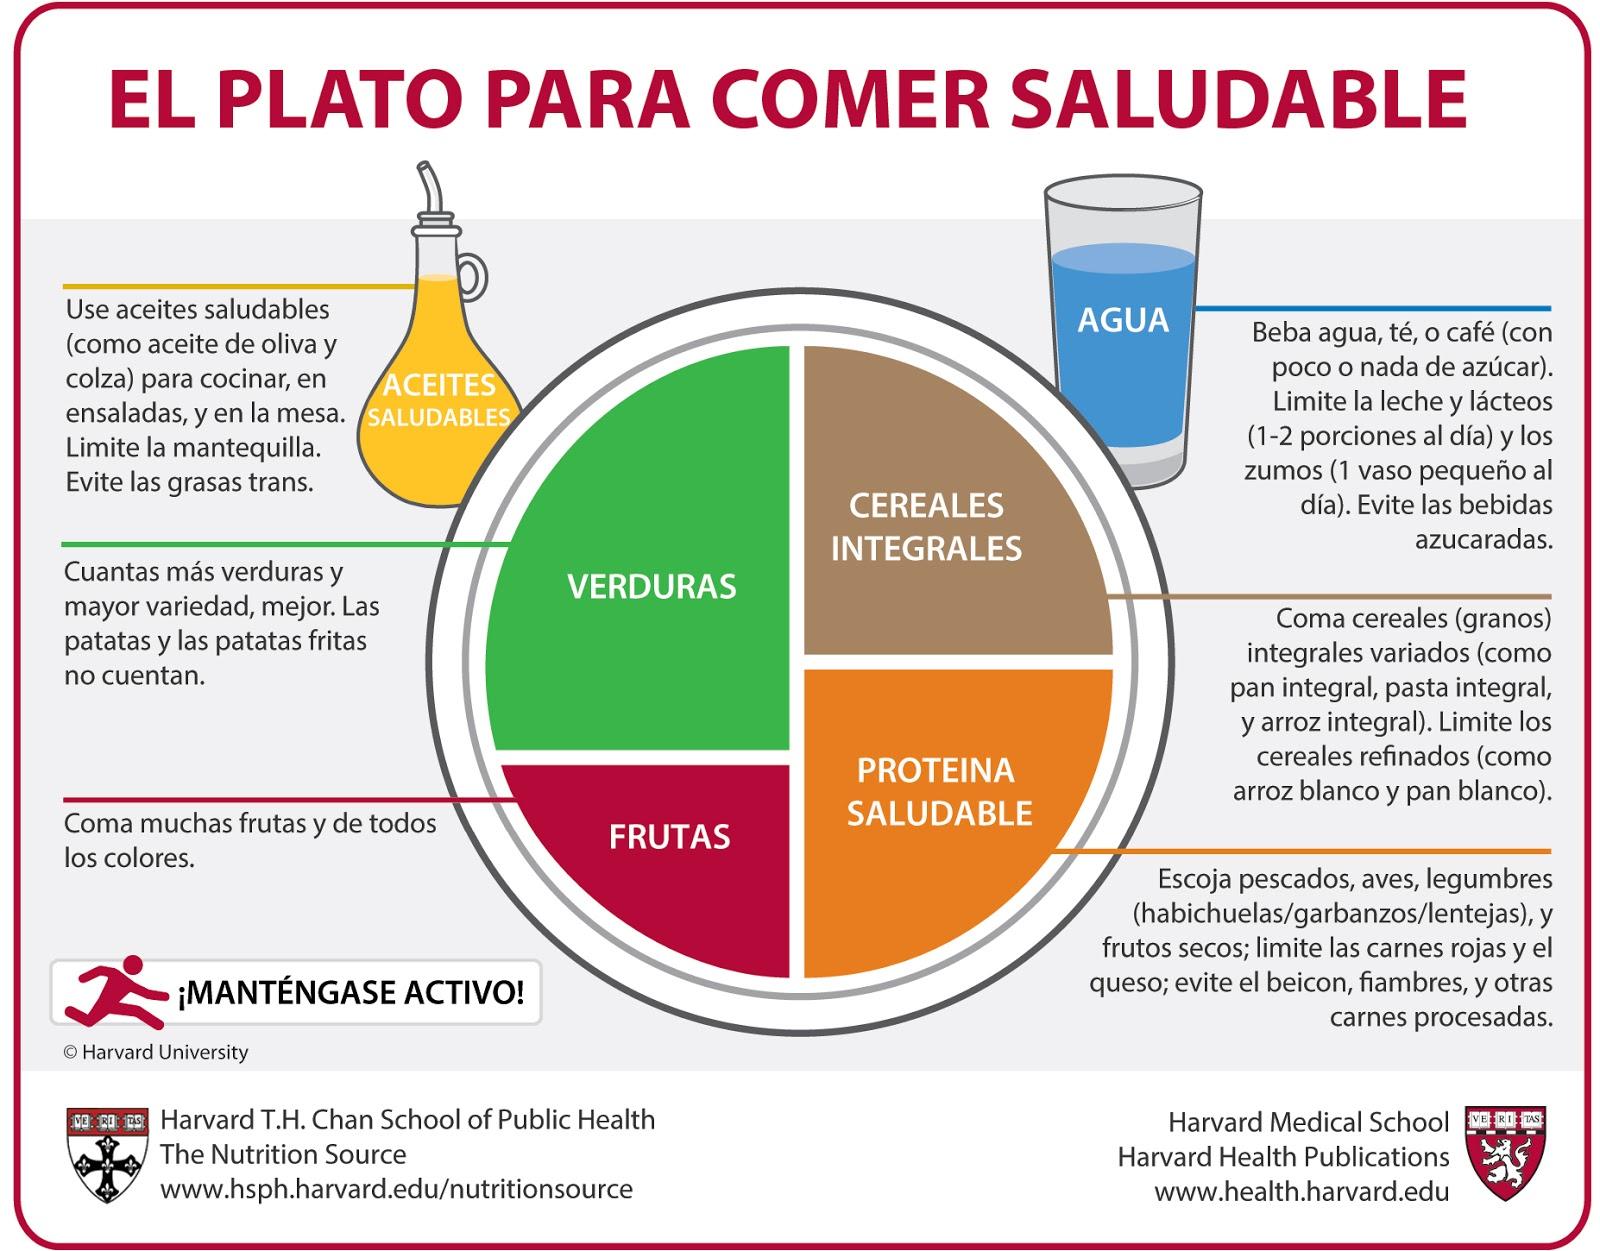 plato-saludable-hardvard-priamide-alimentaria.jpg